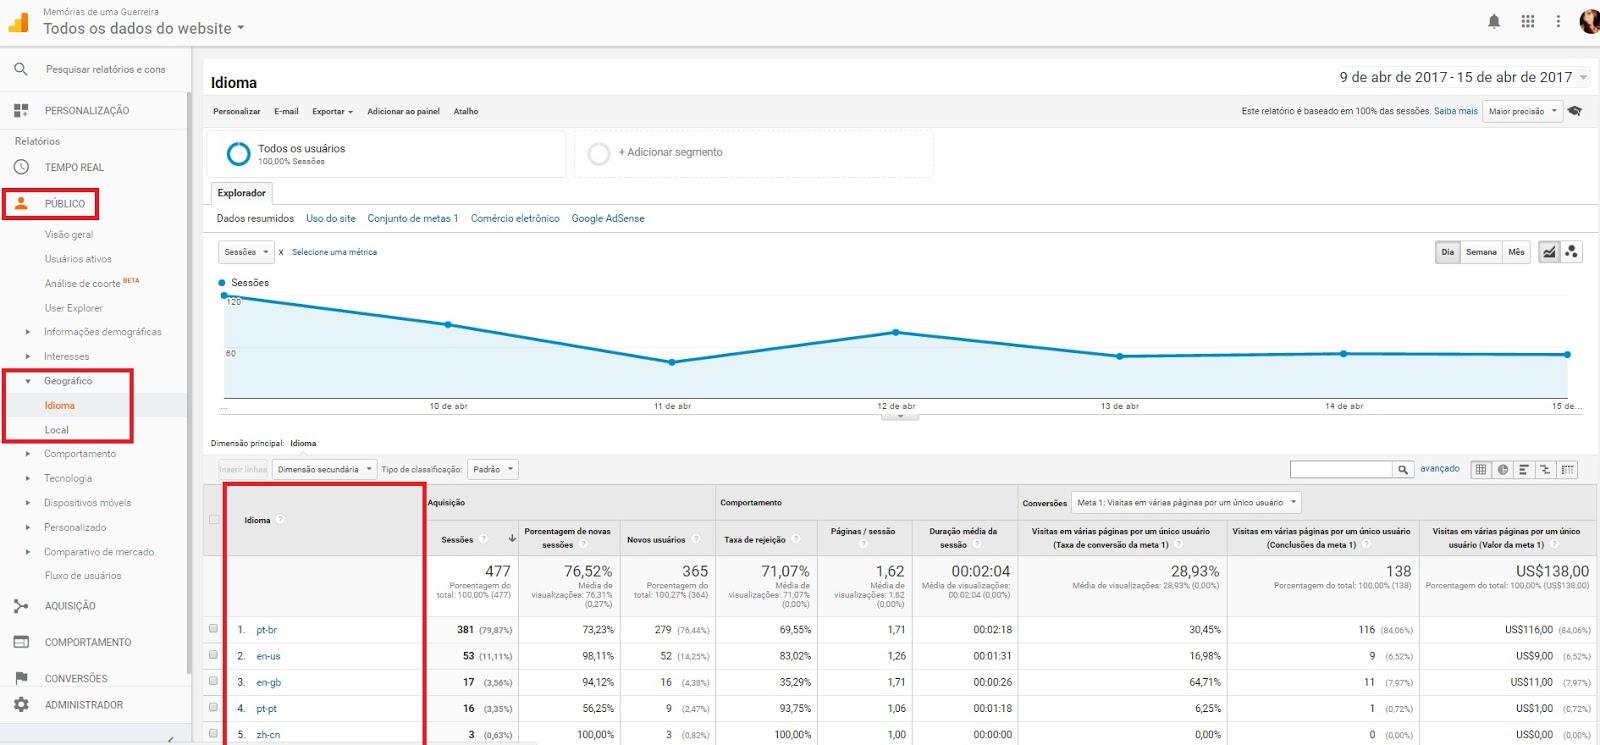 Entendendo o Google Analytics